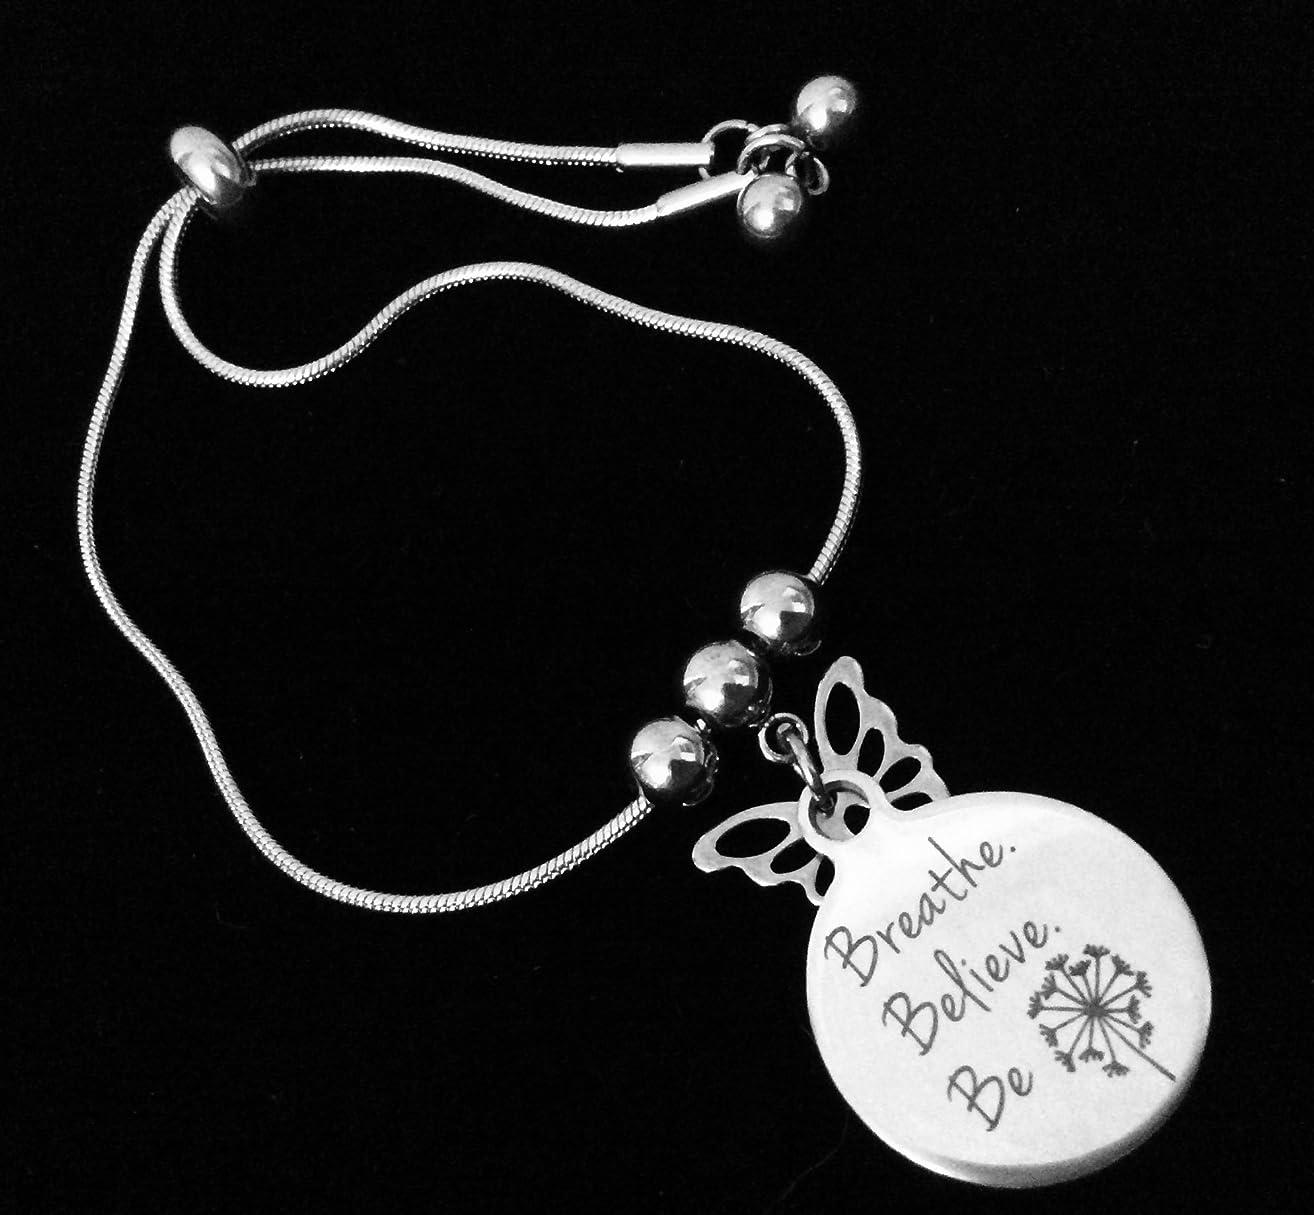 Breathe Believe Be Bolo Bracelet Stainless Steel Adjustable Bracelet Gift Message Charm Bracelet One Size Fits All